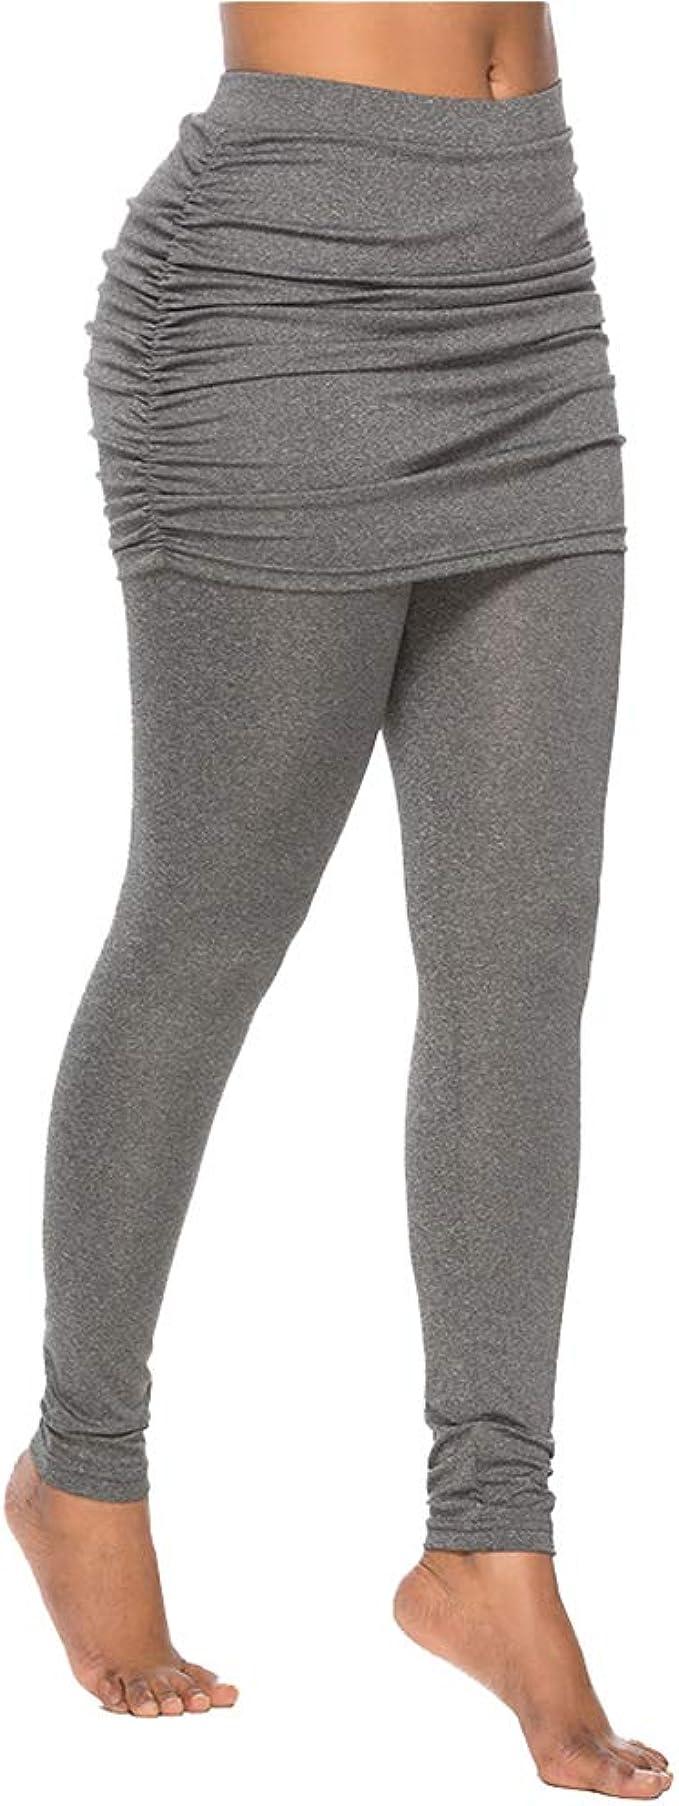 Gagacity Falda Pantalón Mujer Compresion Pantalones Deportivos ...